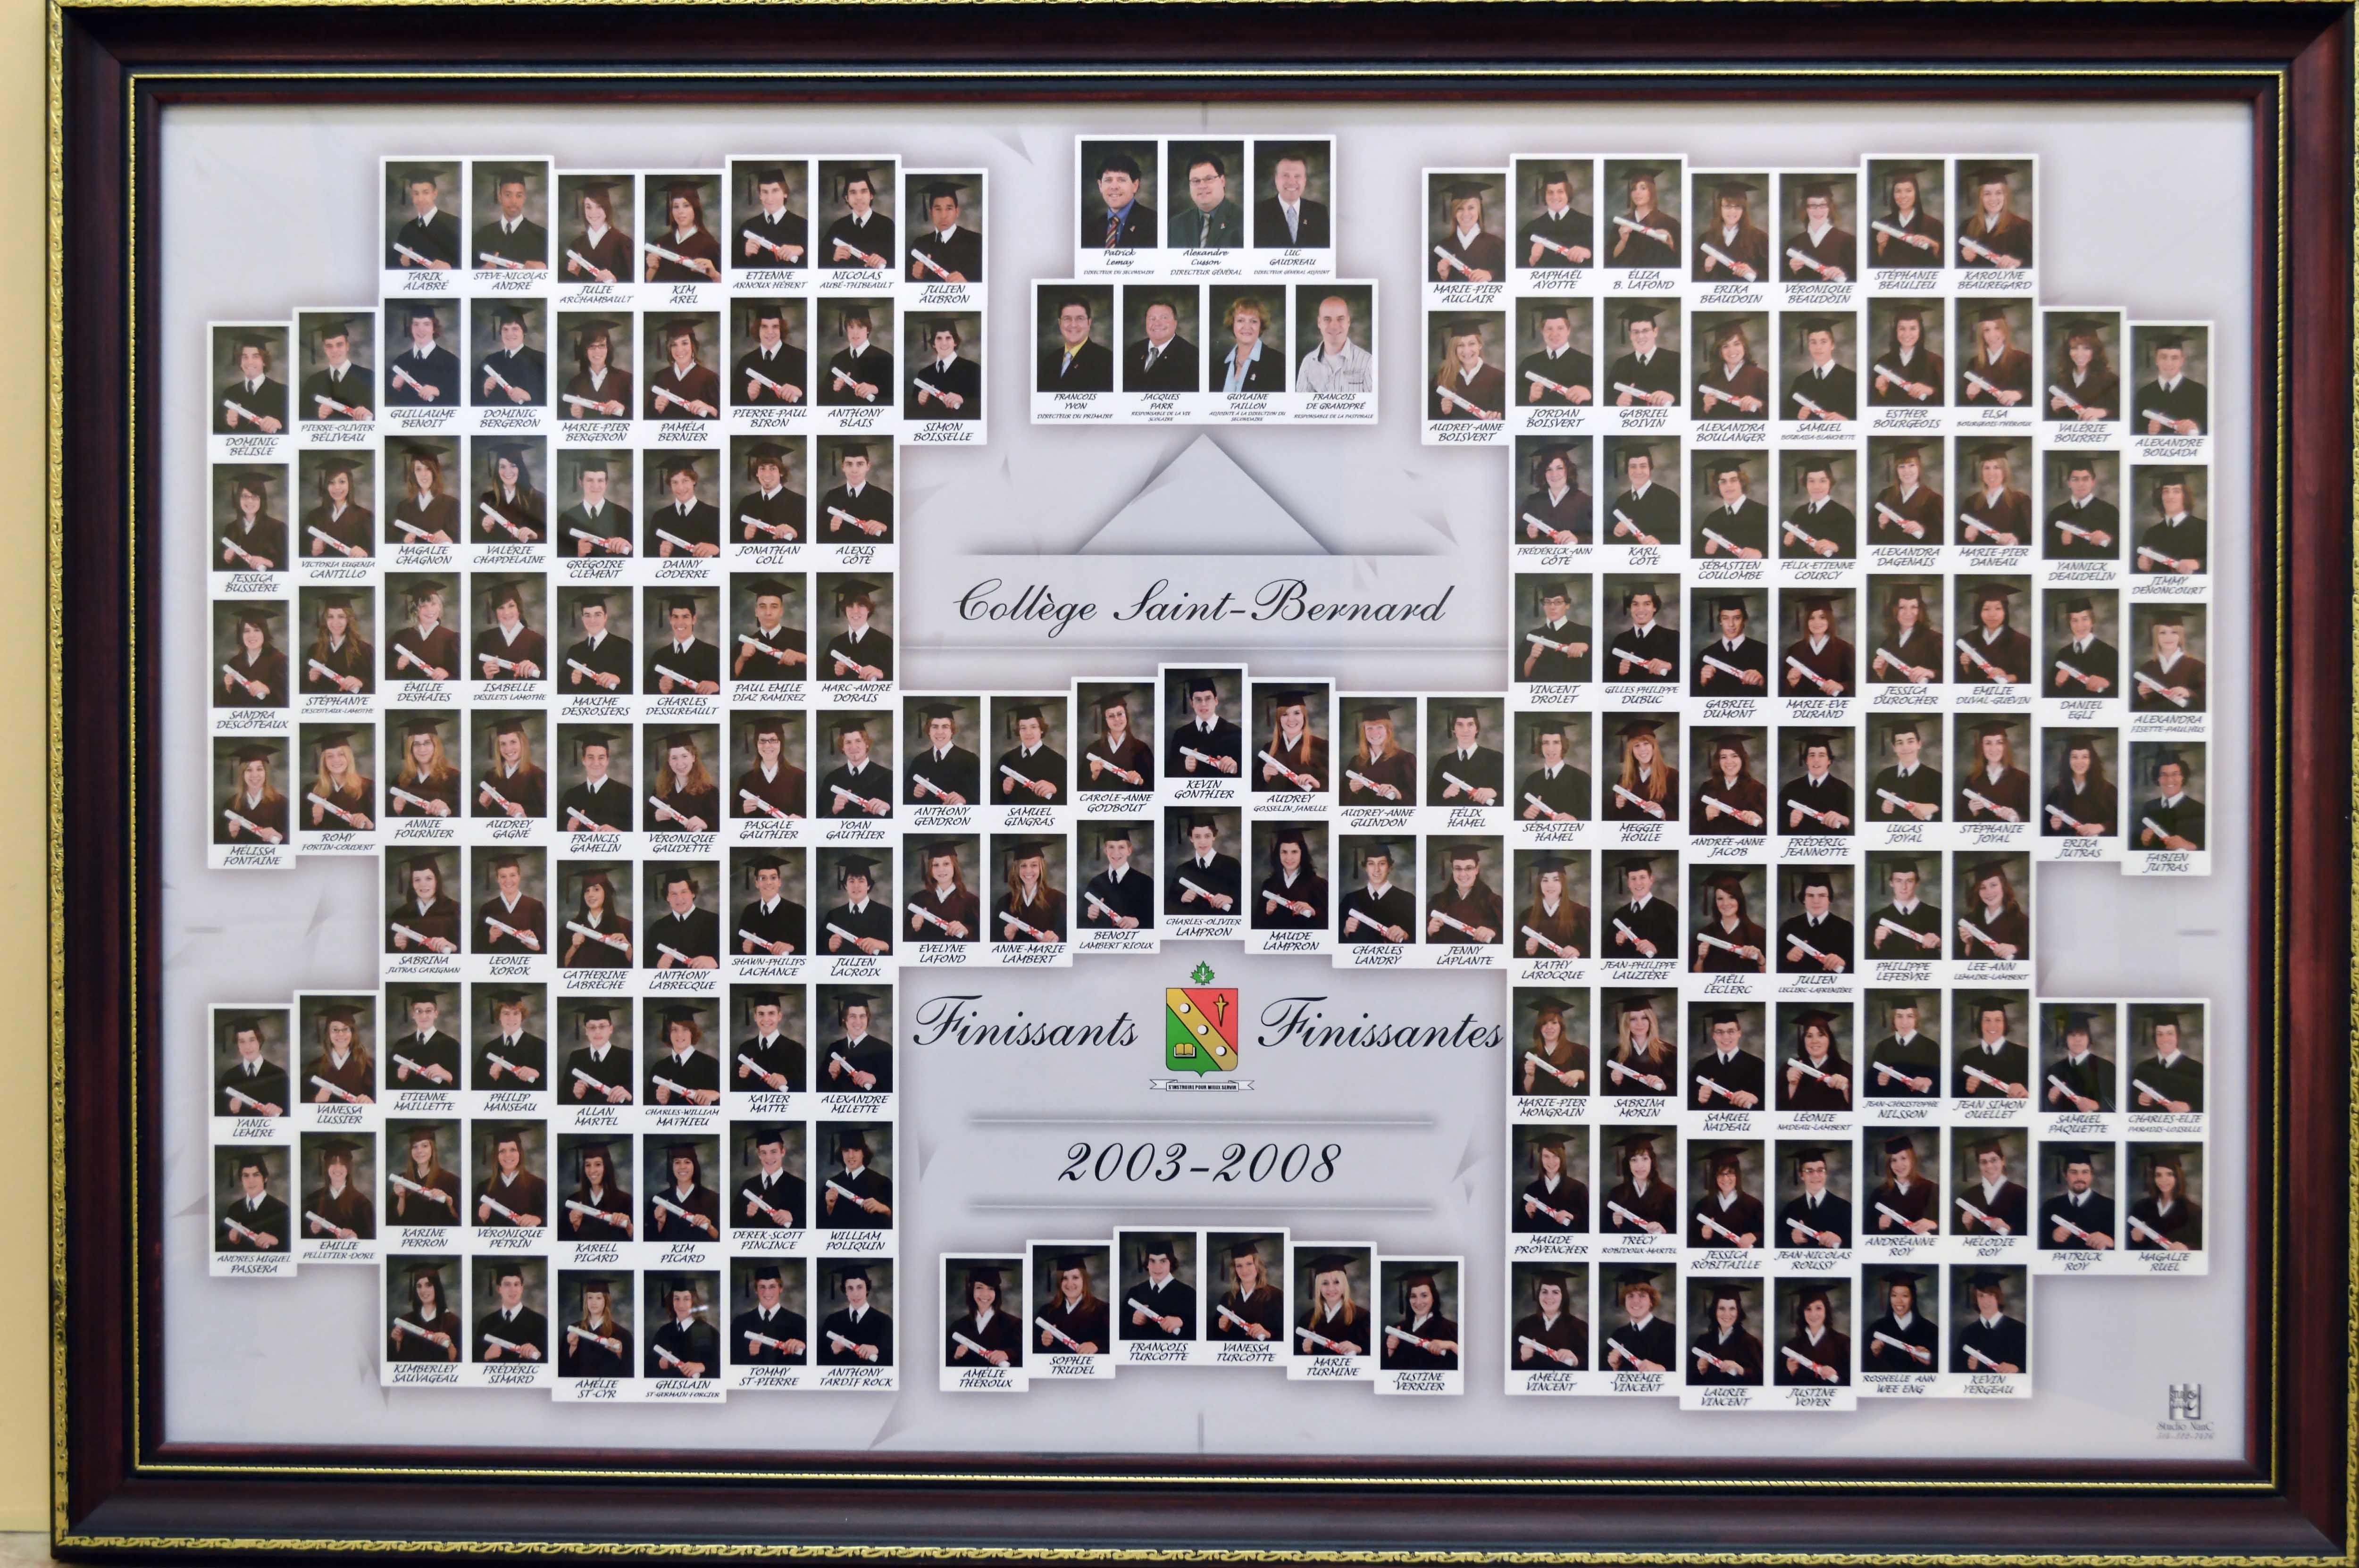 College-Saint-Bernard_Graduations-2007-08